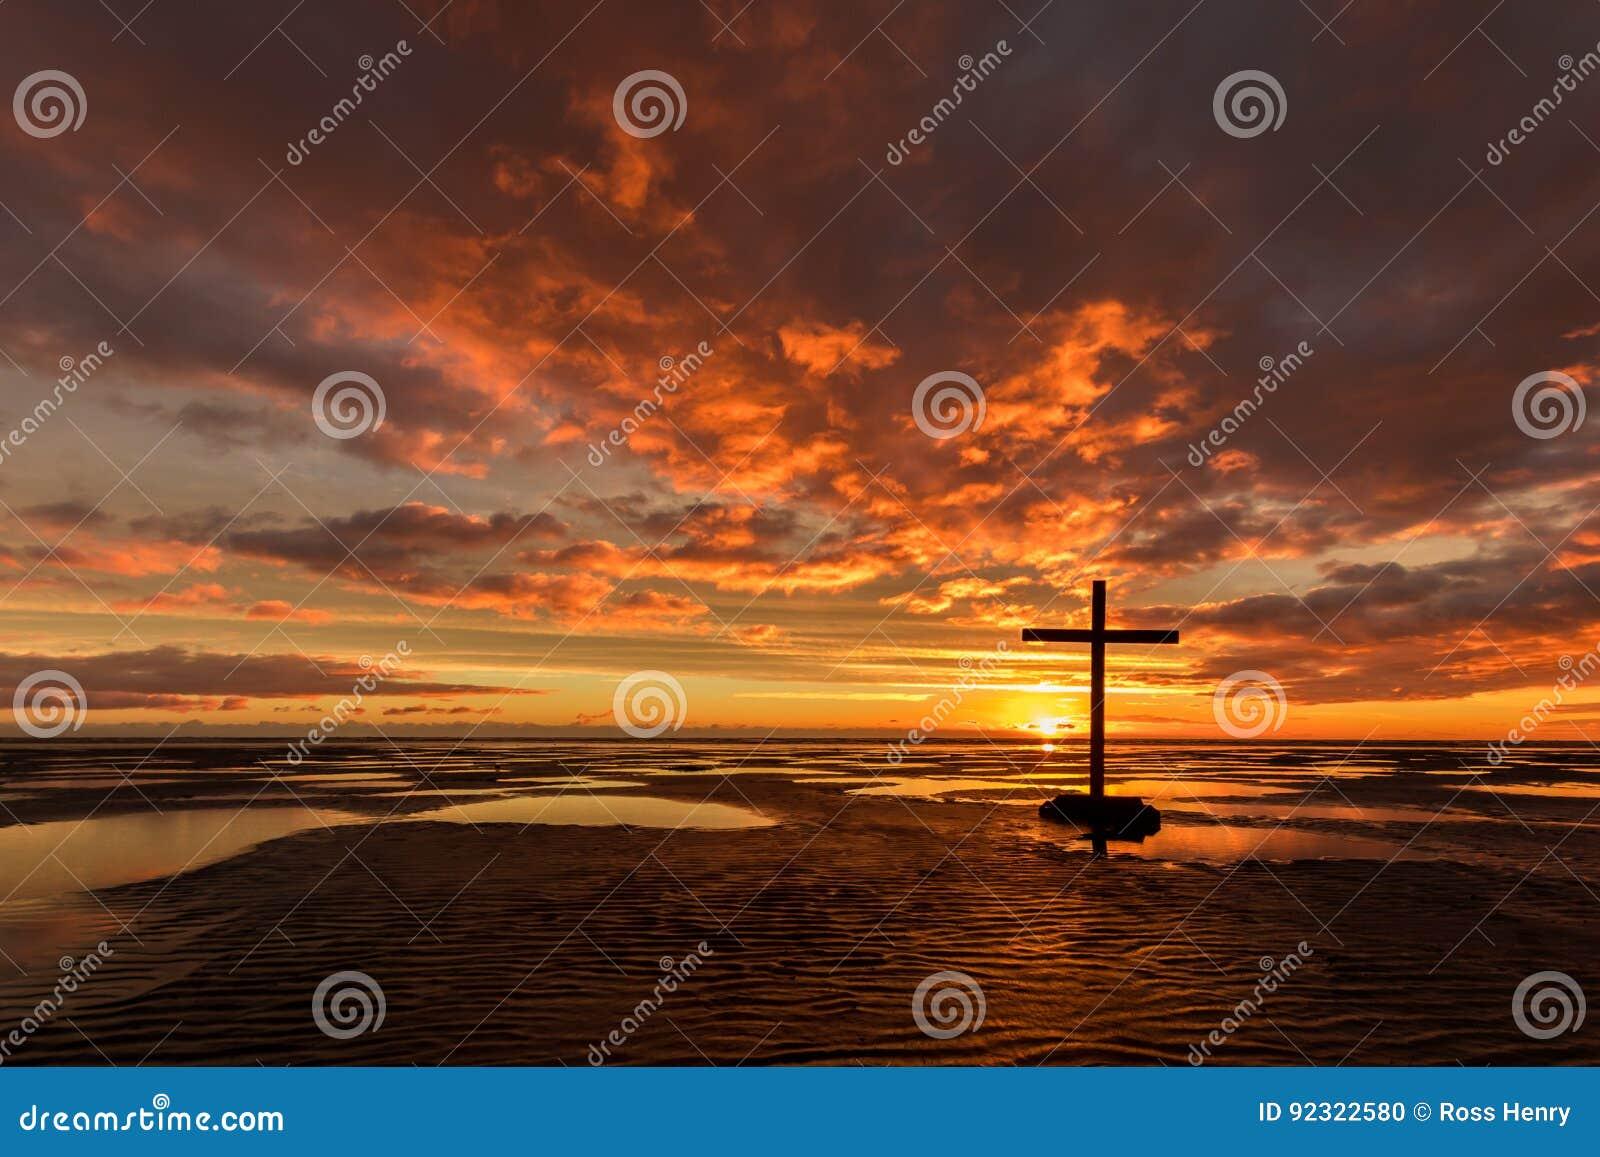 Low Tide Salvation Black Cross